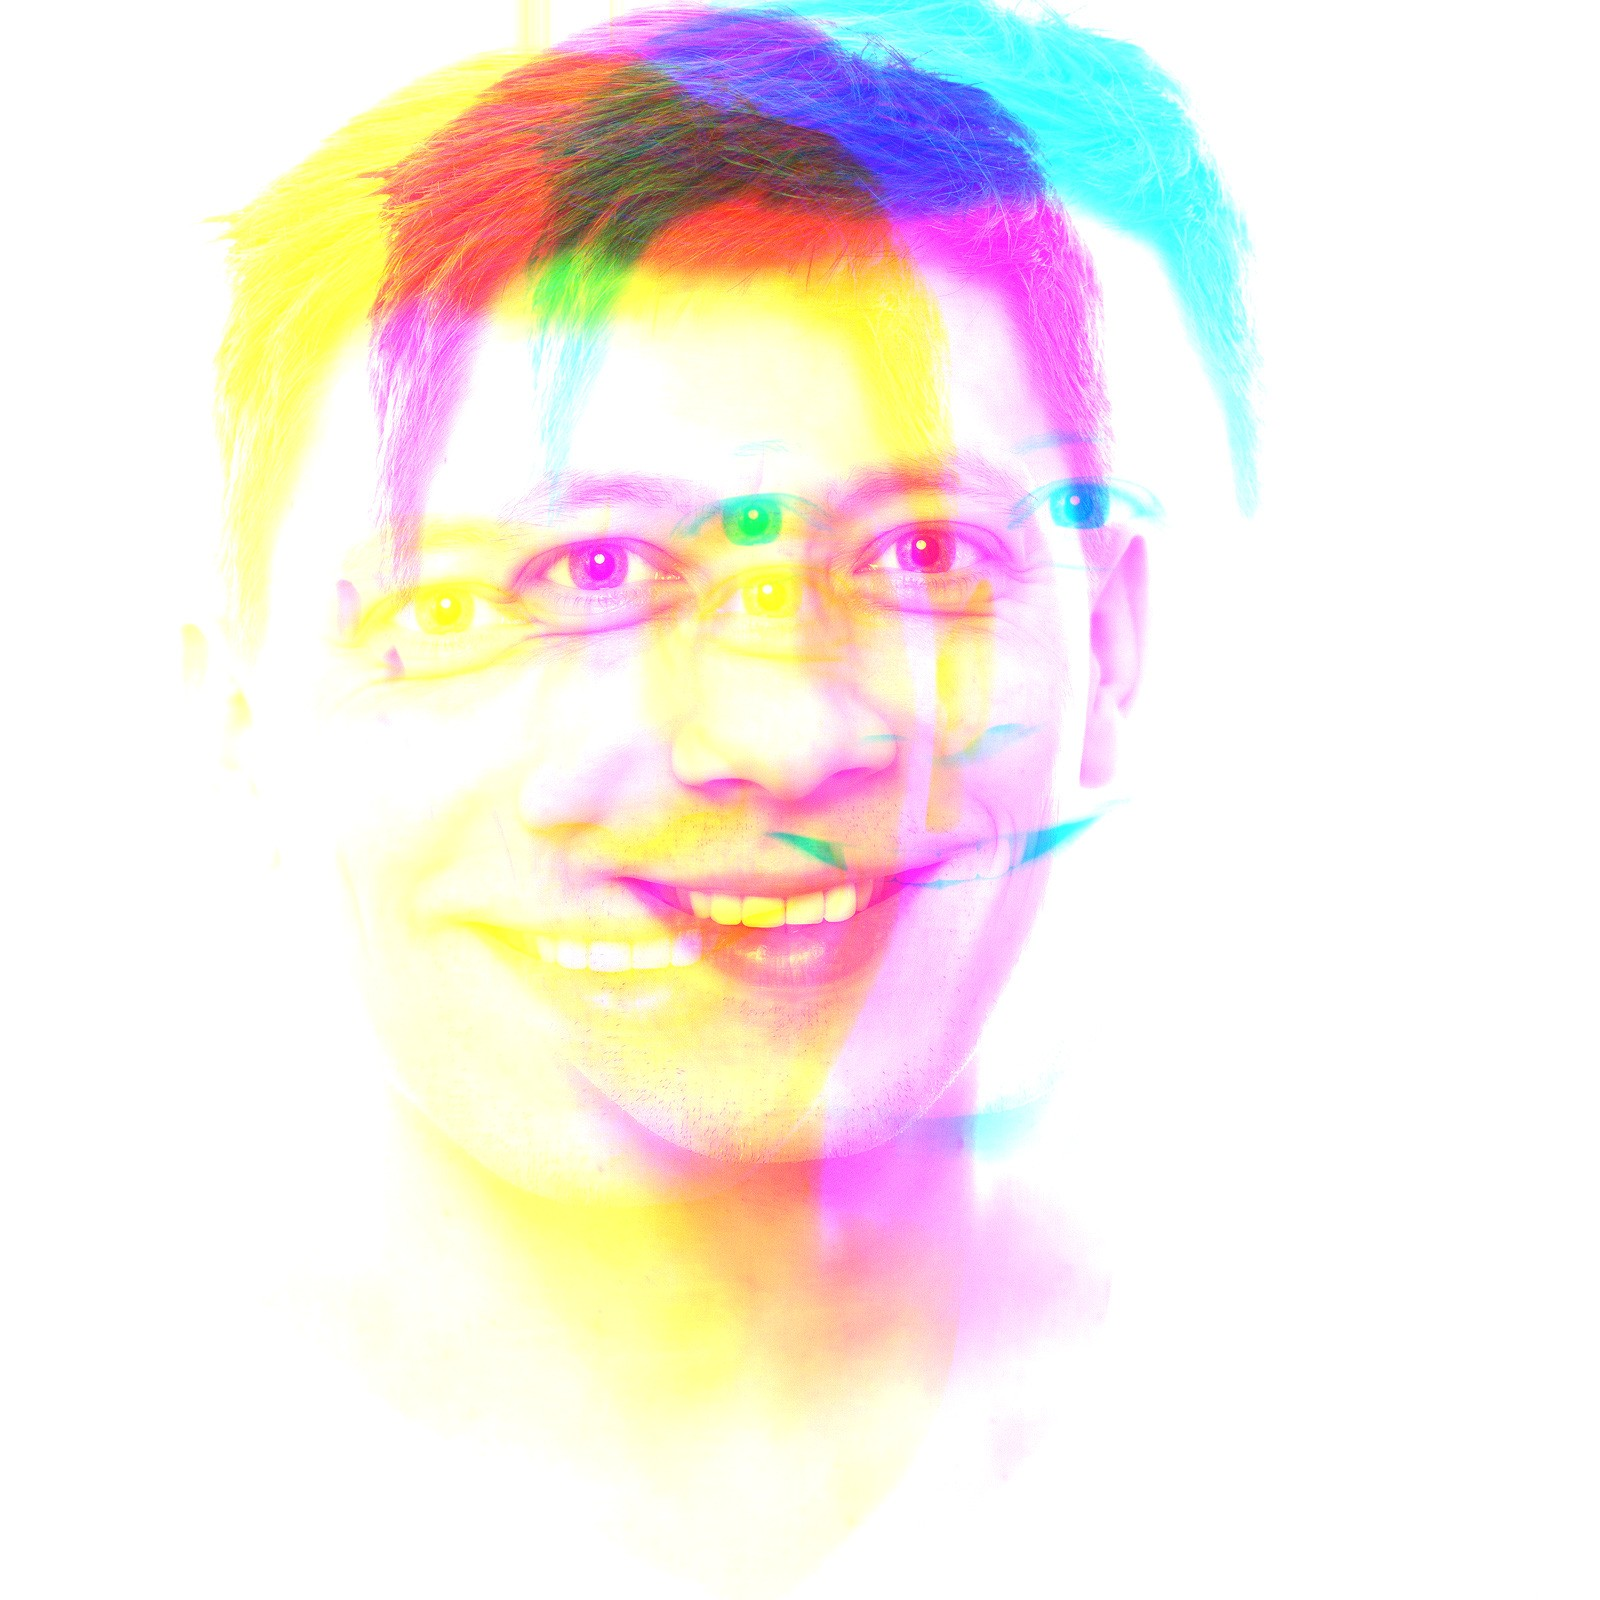 RGB Shift selfie